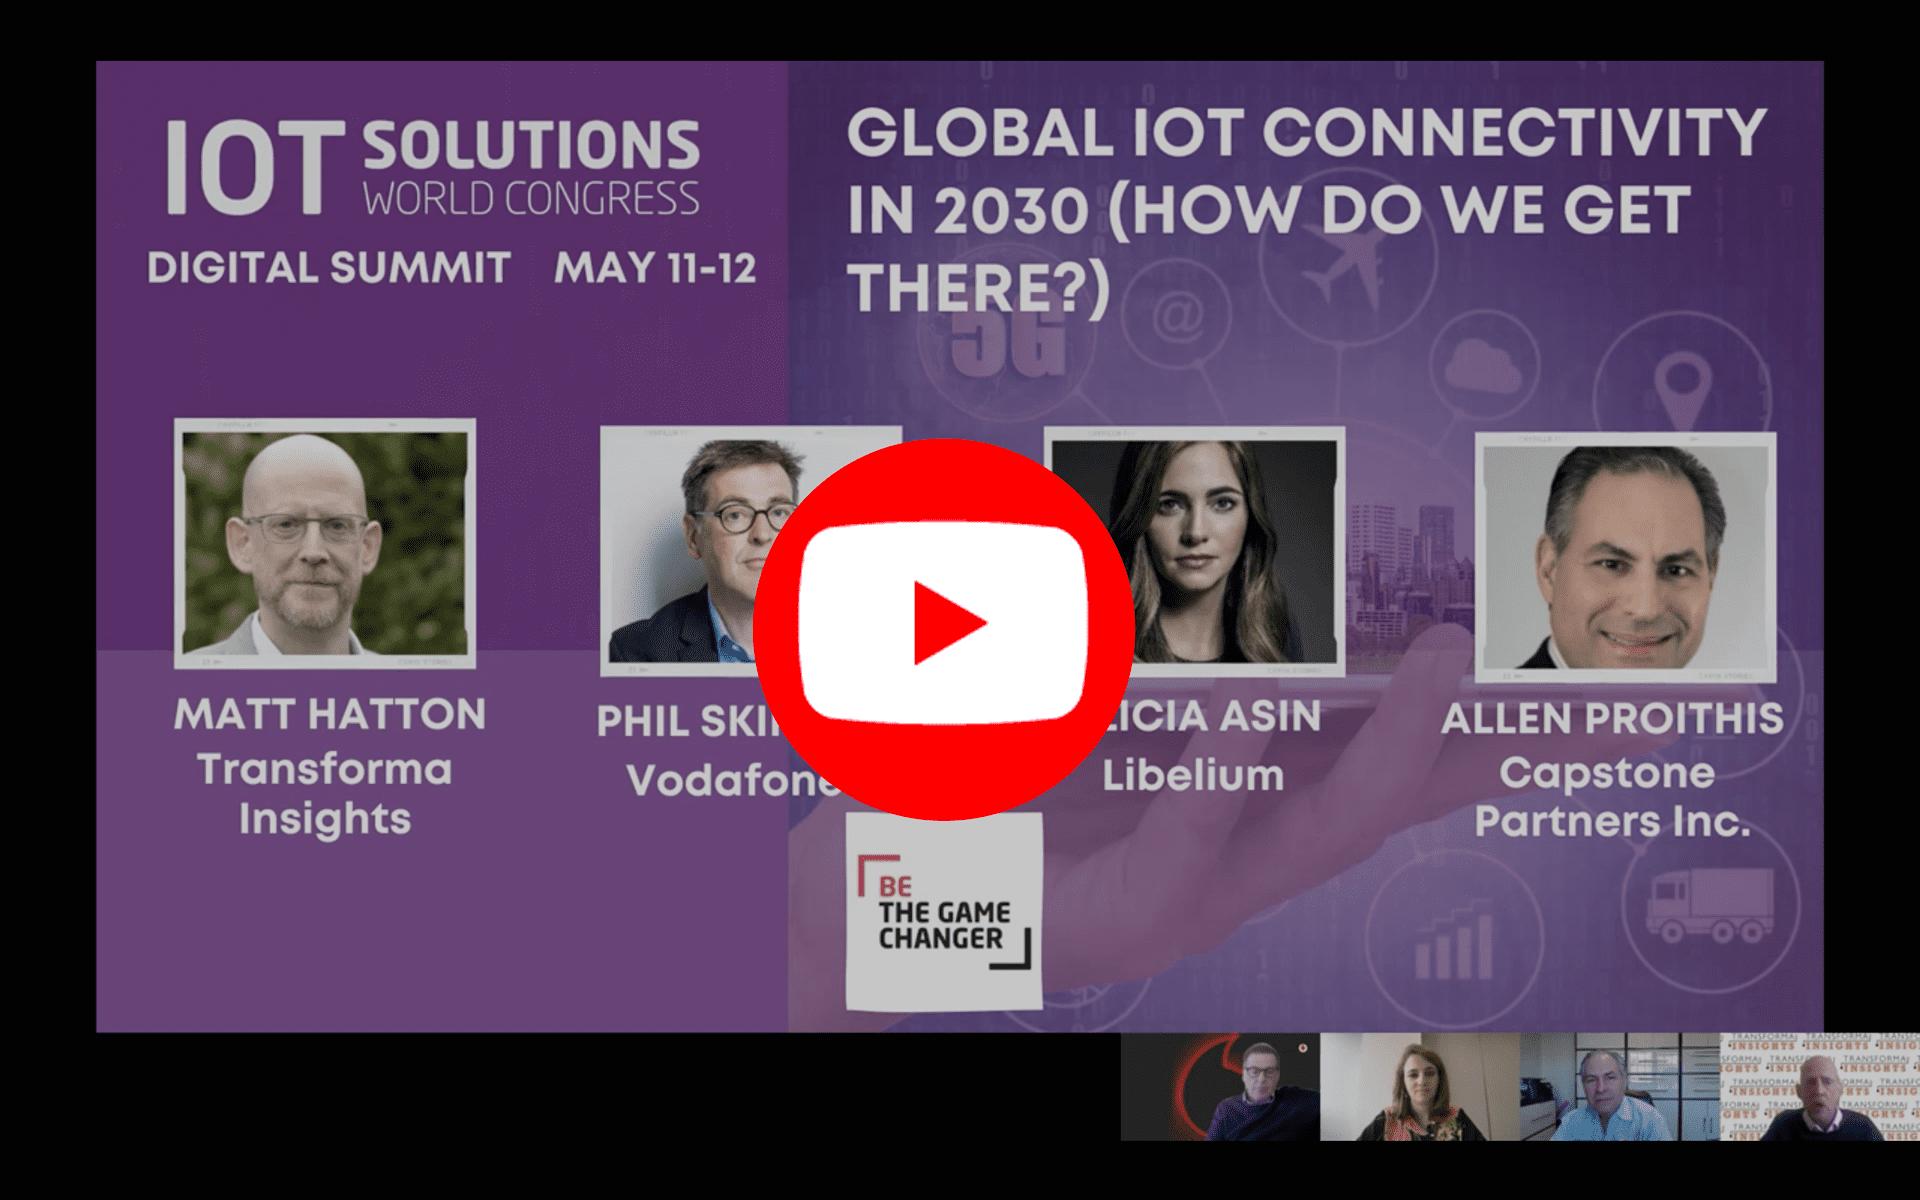 Alicia Asín's Intervention IoT Solution World Congress 2021